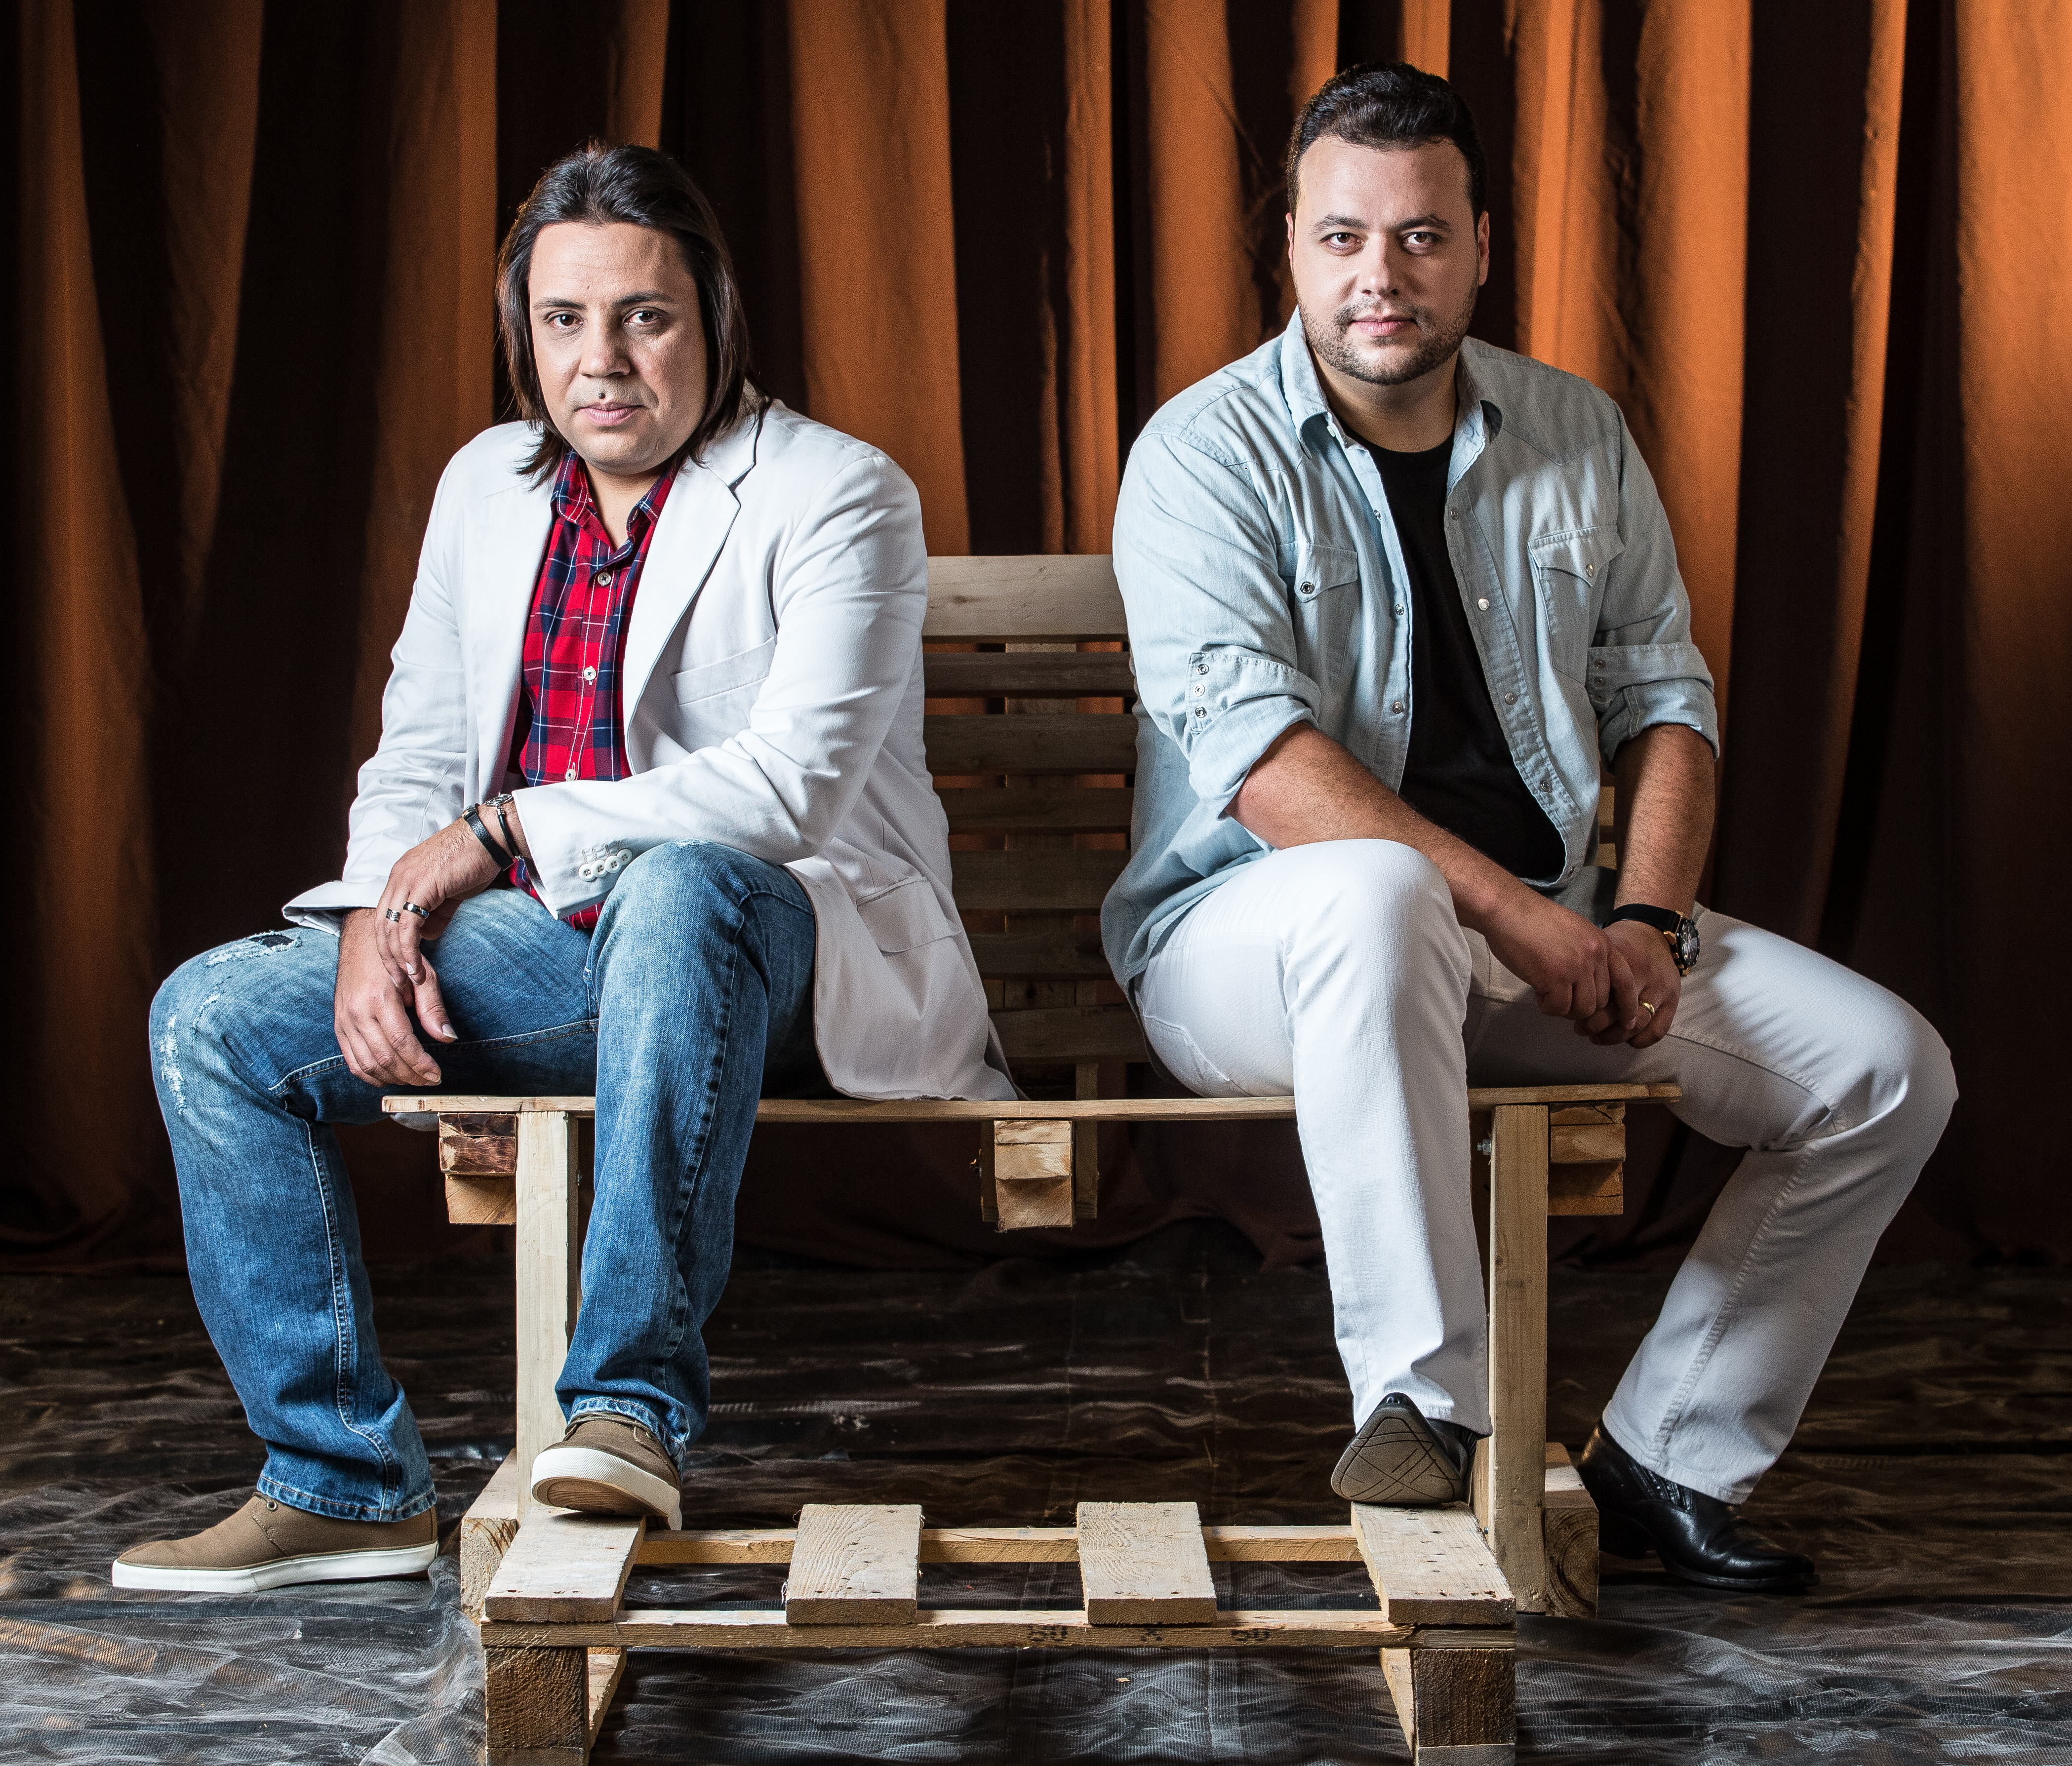 Luiz Mazza & Luciano divulgam teaser do novo álbum